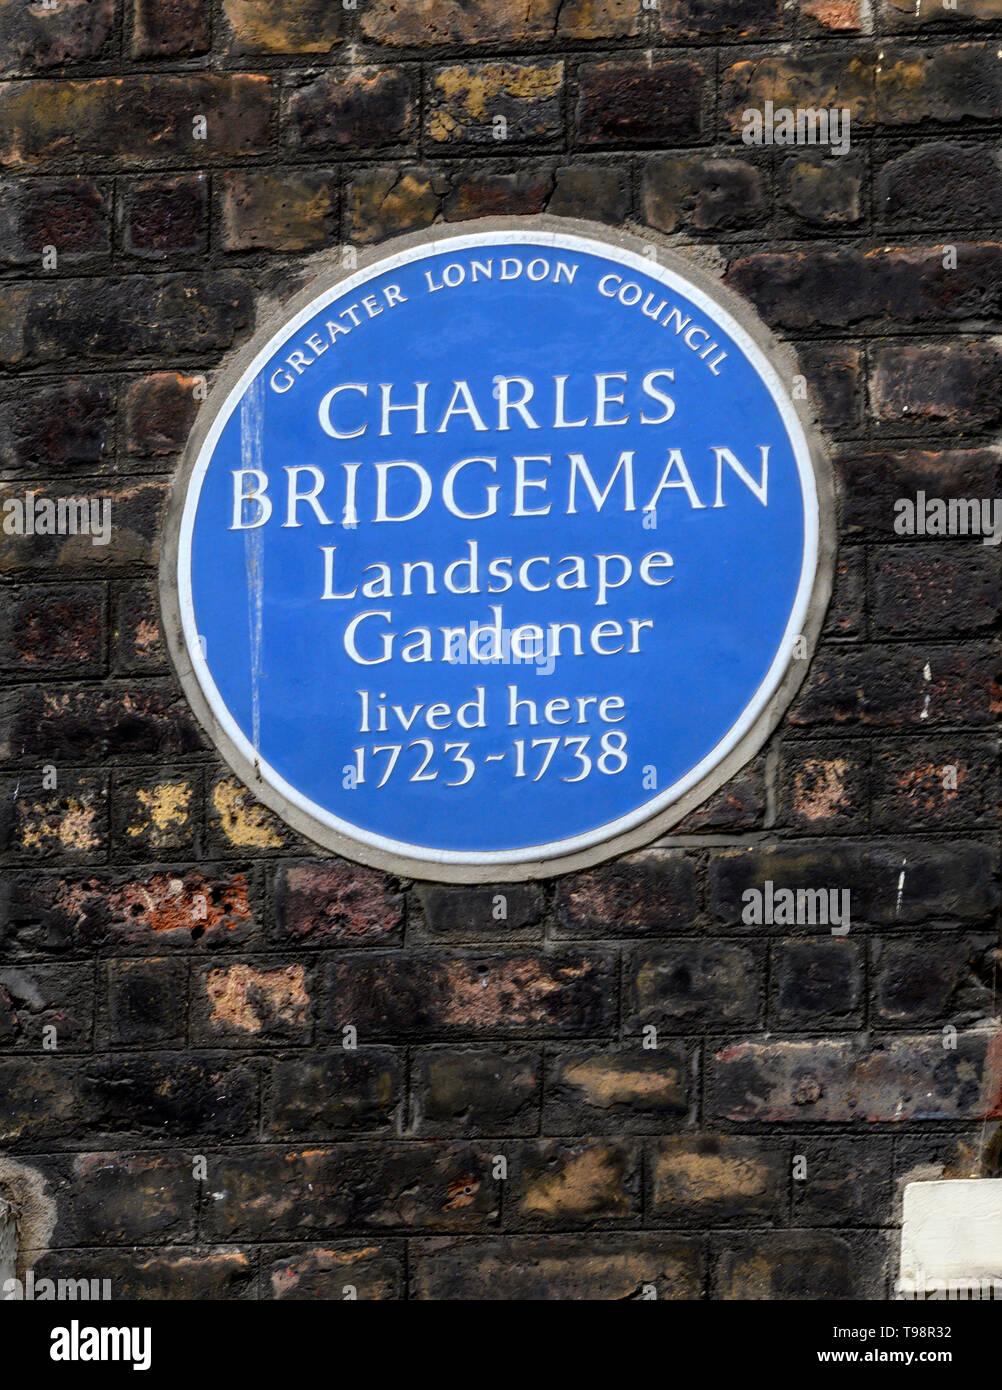 Greater London Blue Plaque marking a home of landscape gardener Charles Bridgeman 1723-1738 Broadwick Street, Soho, London, UK Stock Photo